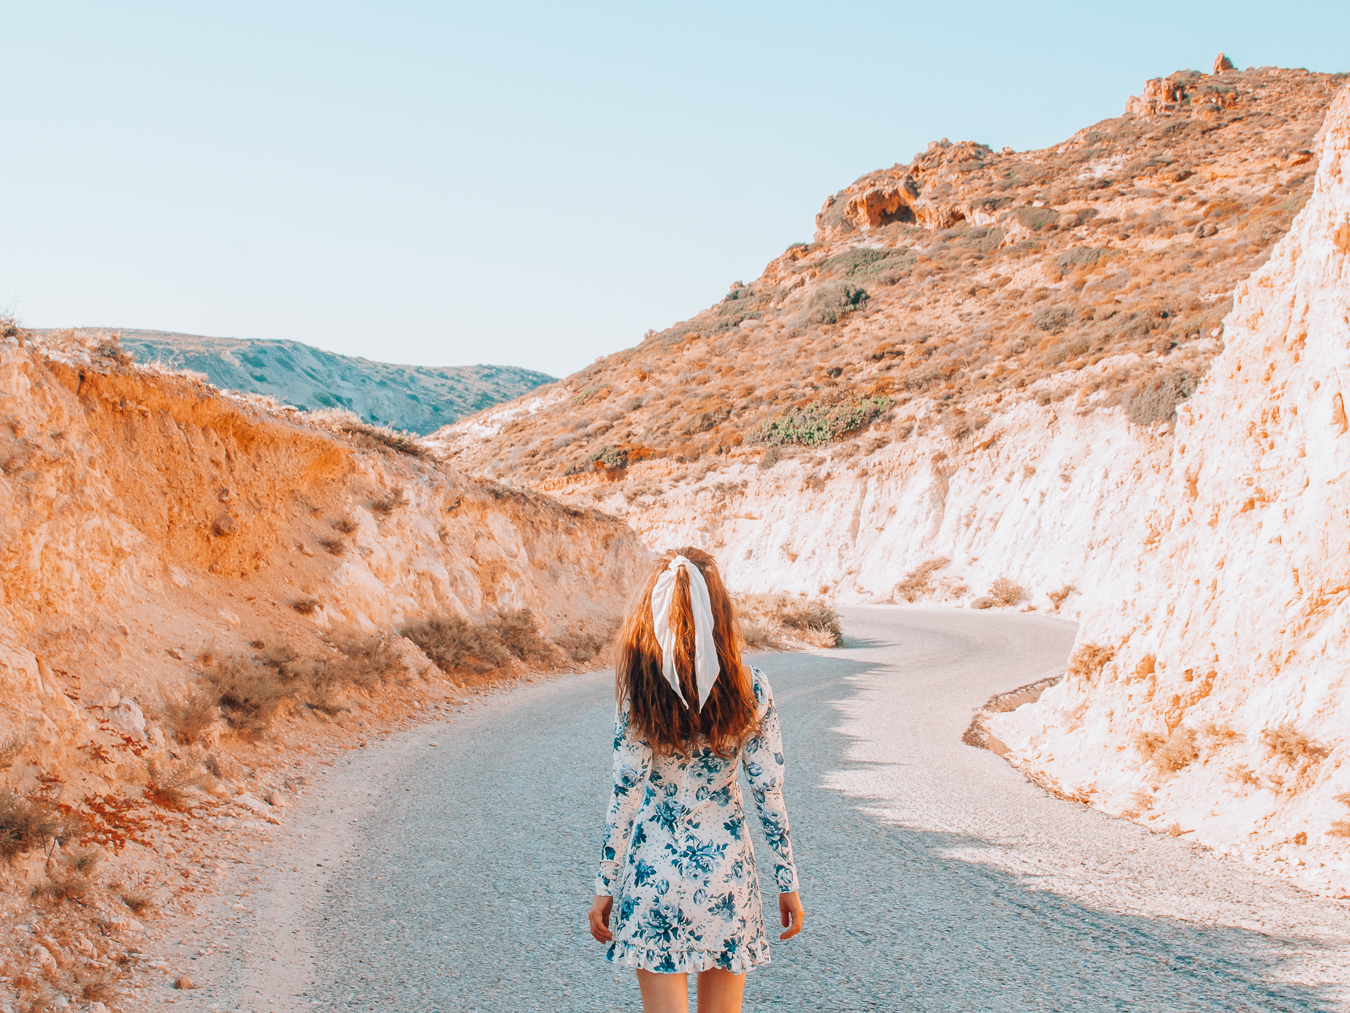 Girl walking on a road